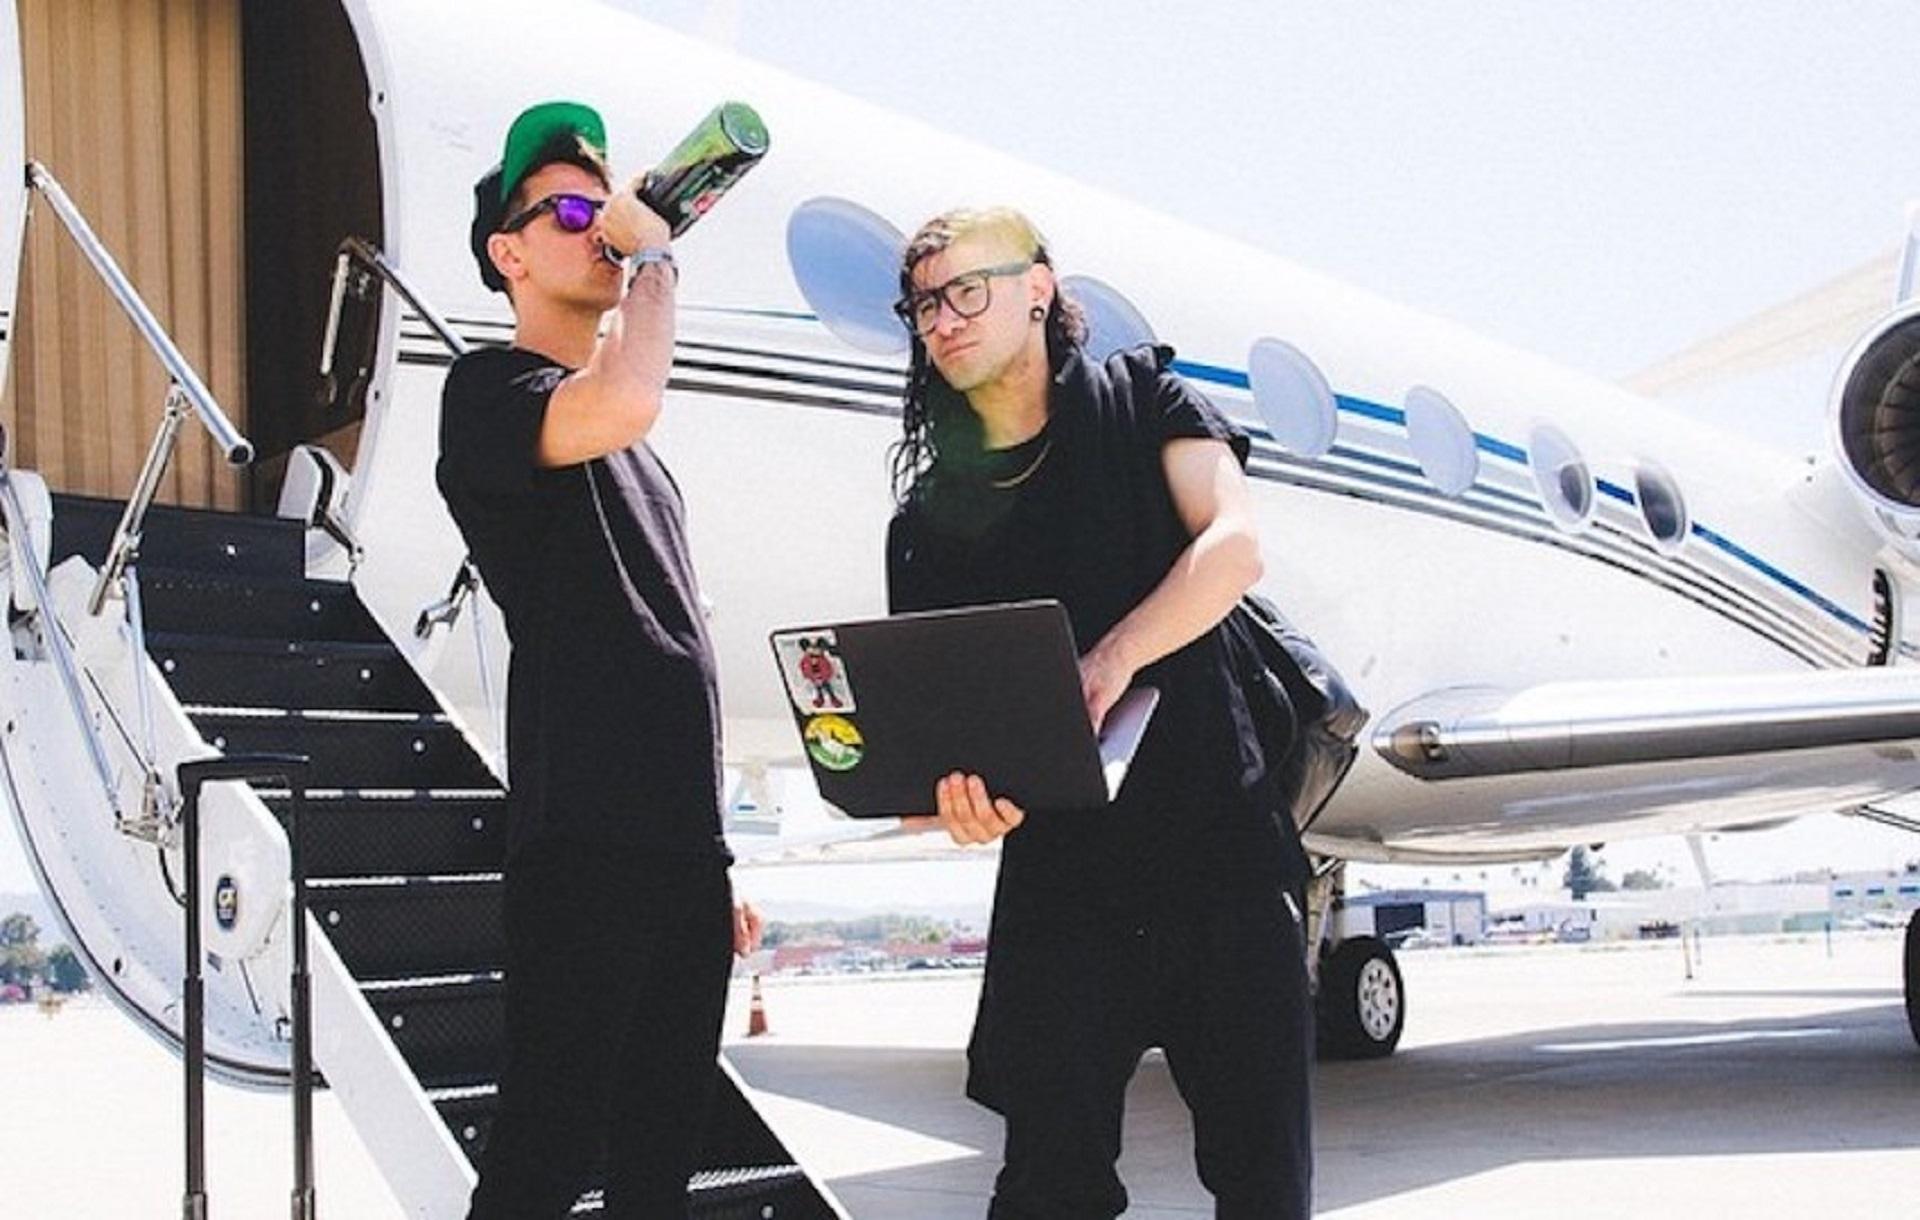 SkrillexがDog BloodとTy Dolla $ignのコラボ曲を近日リリースすることを発表!